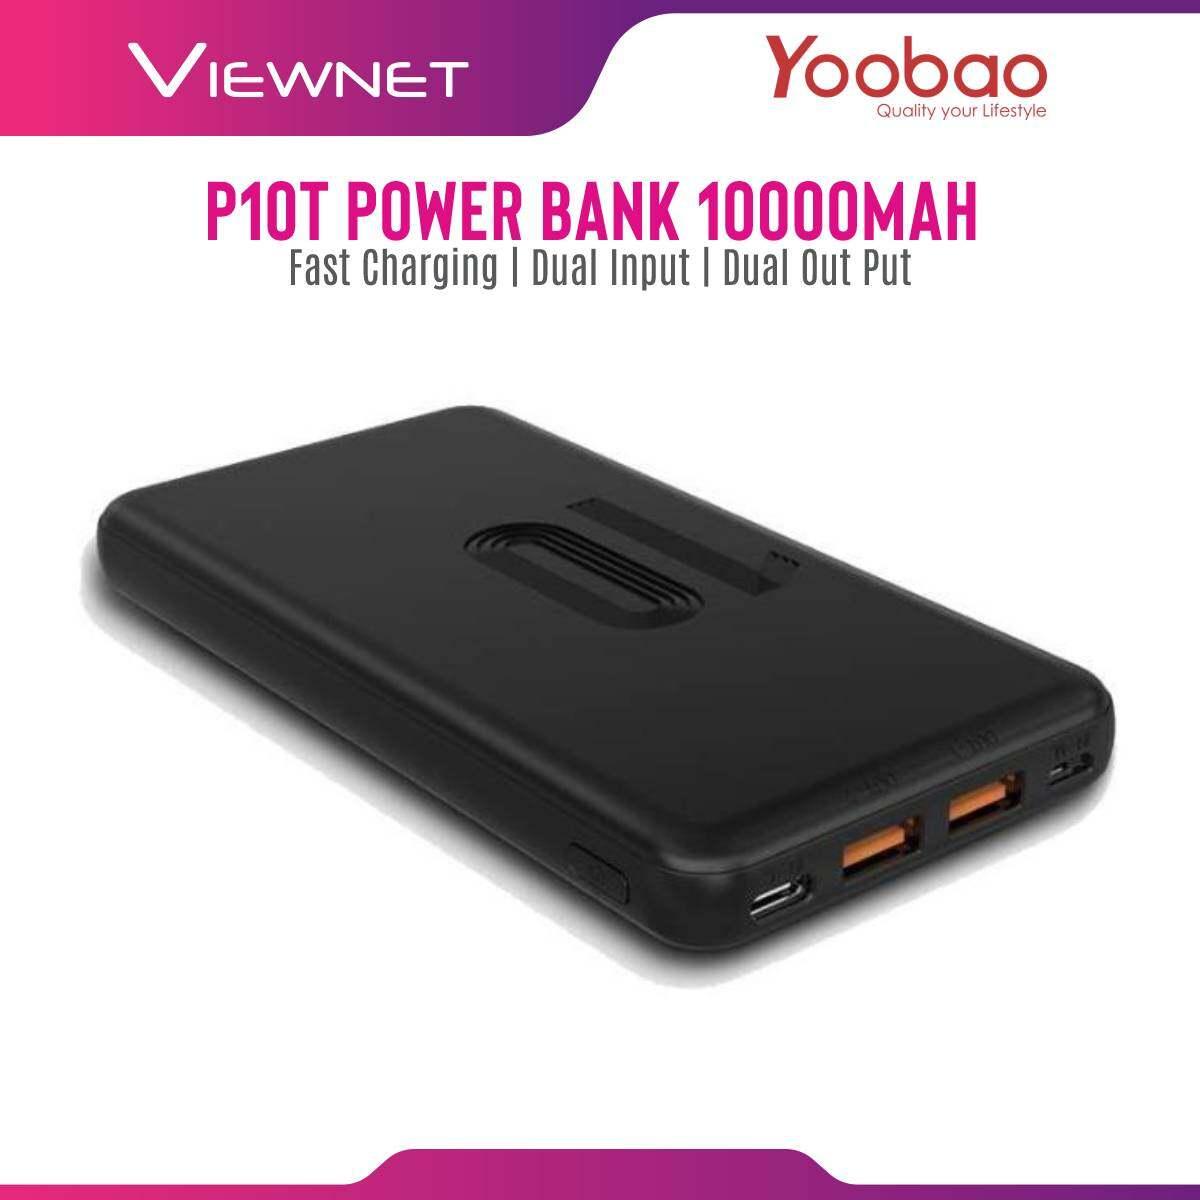 Yoobao PowerBank P10T Power Desire 10000mAh Fast Charge Slim Portable Powerbank with Dual-output